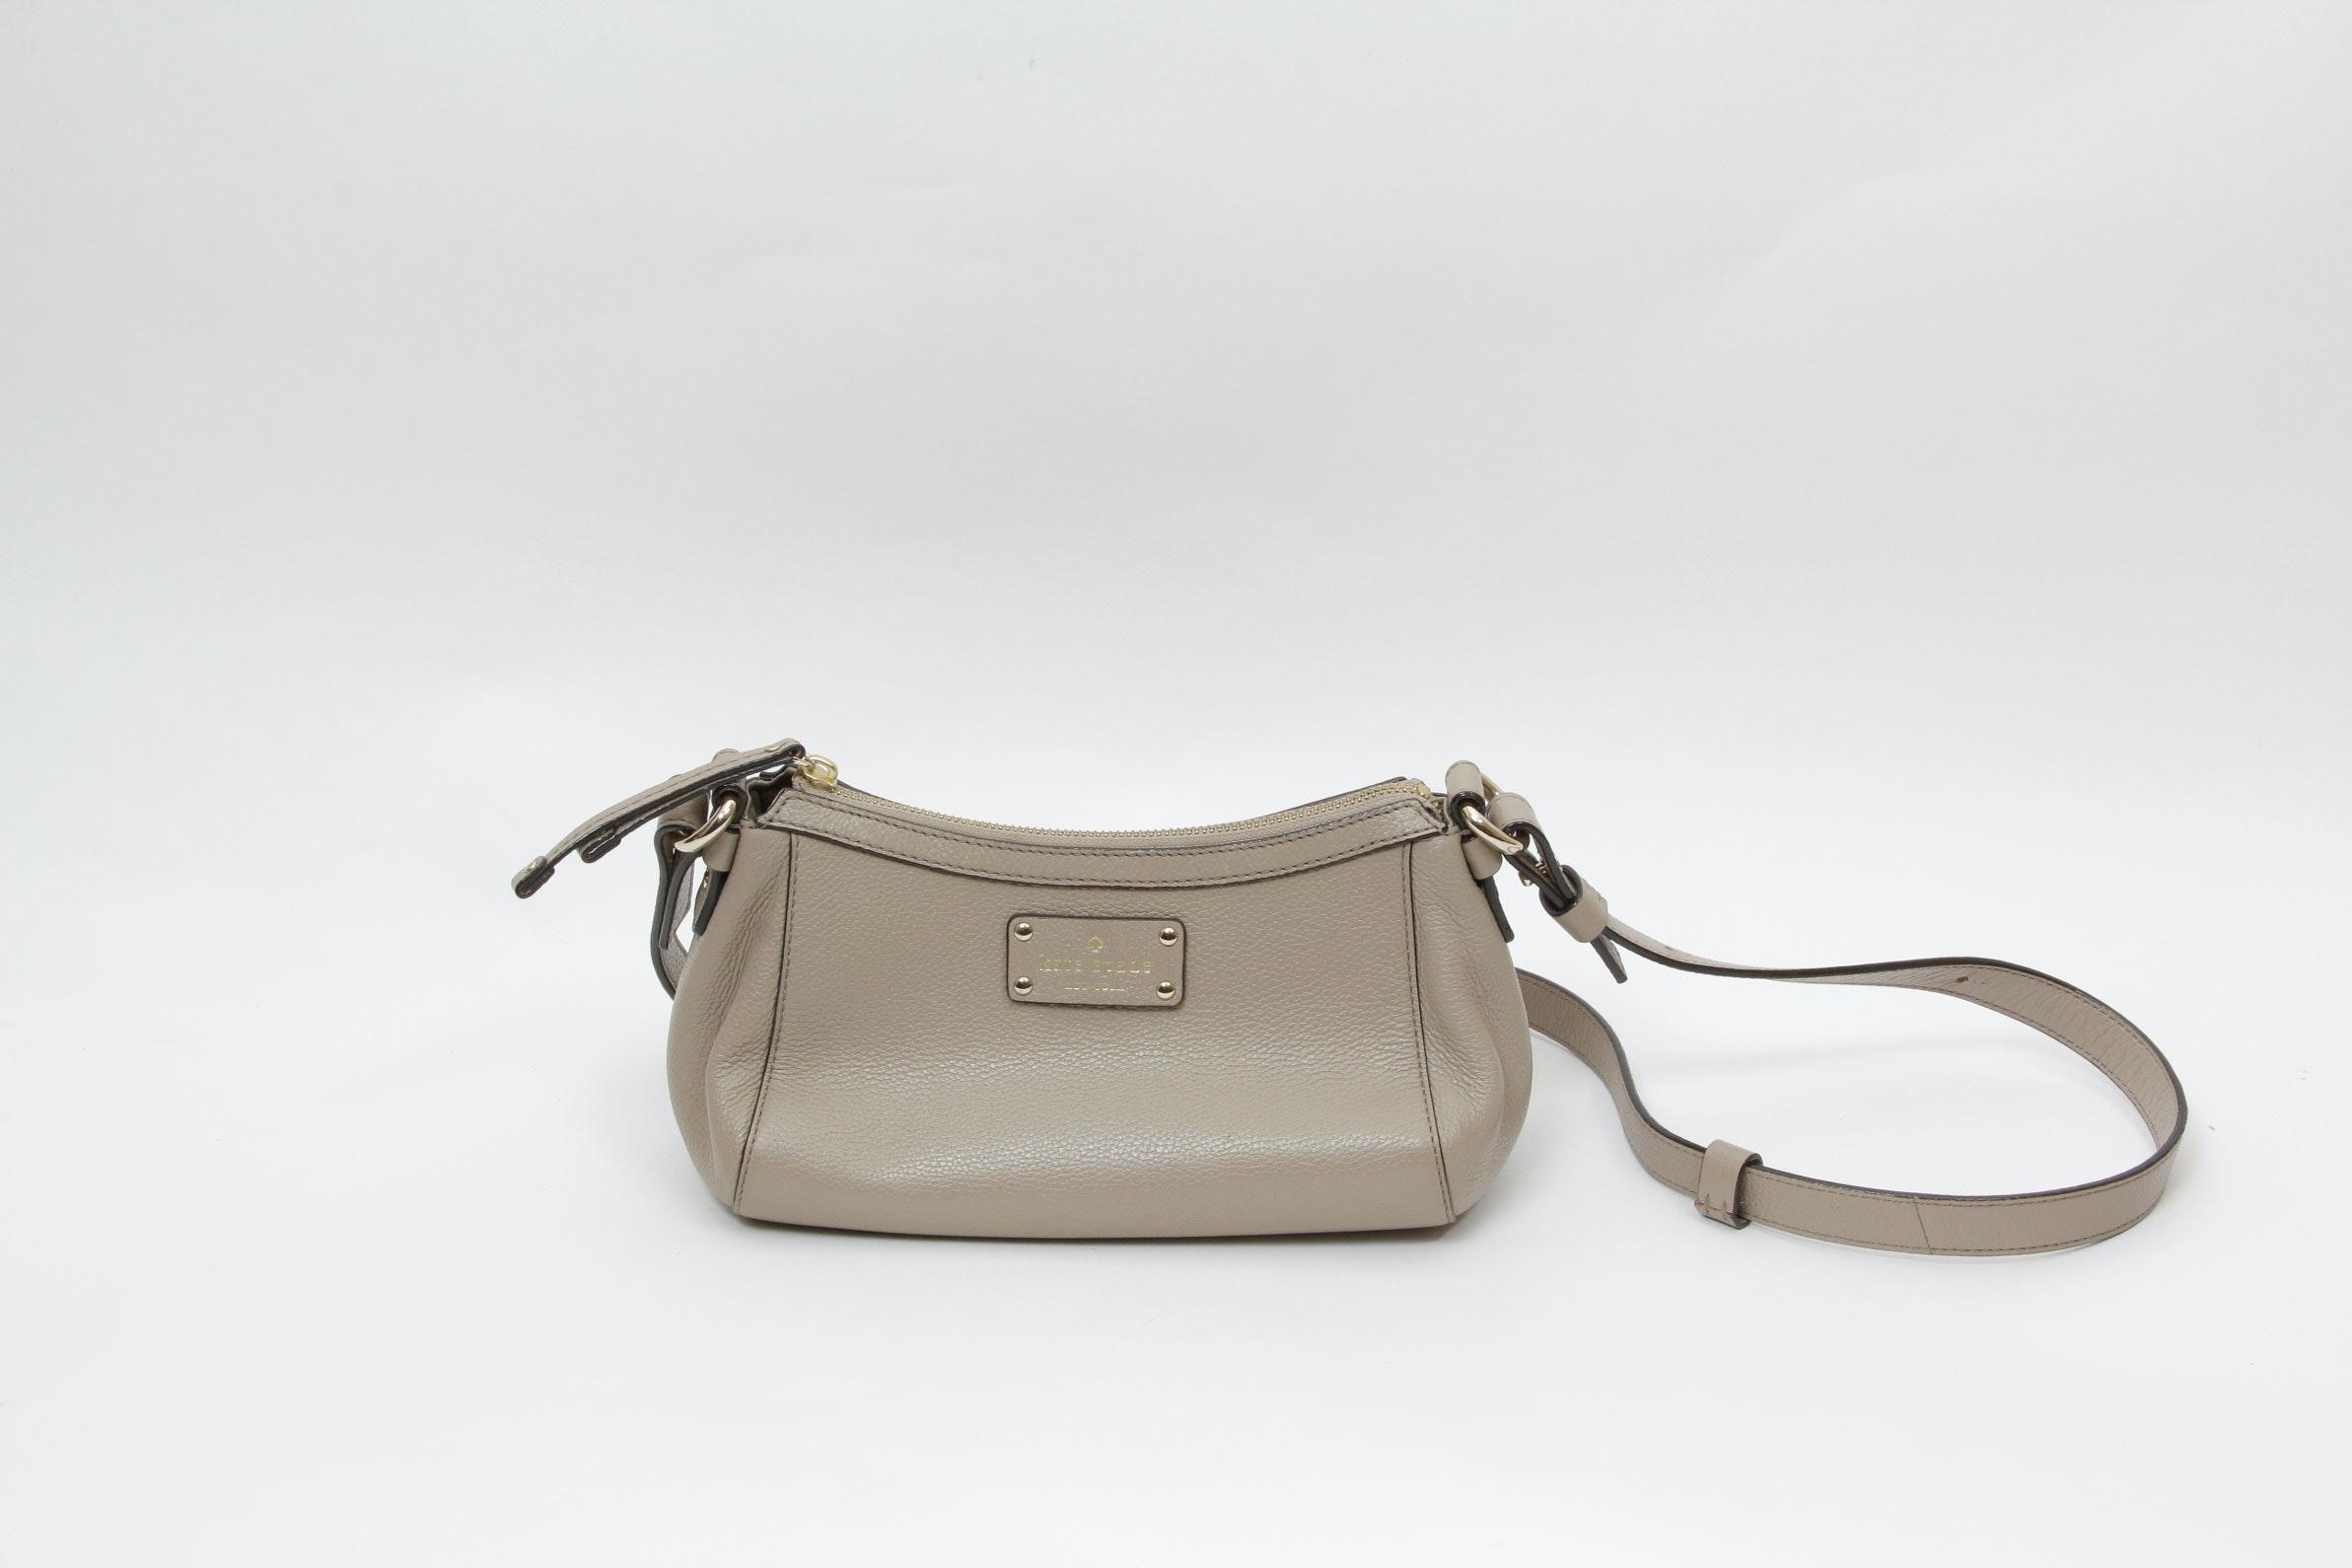 Kate Spade Leather Cross Body Bag